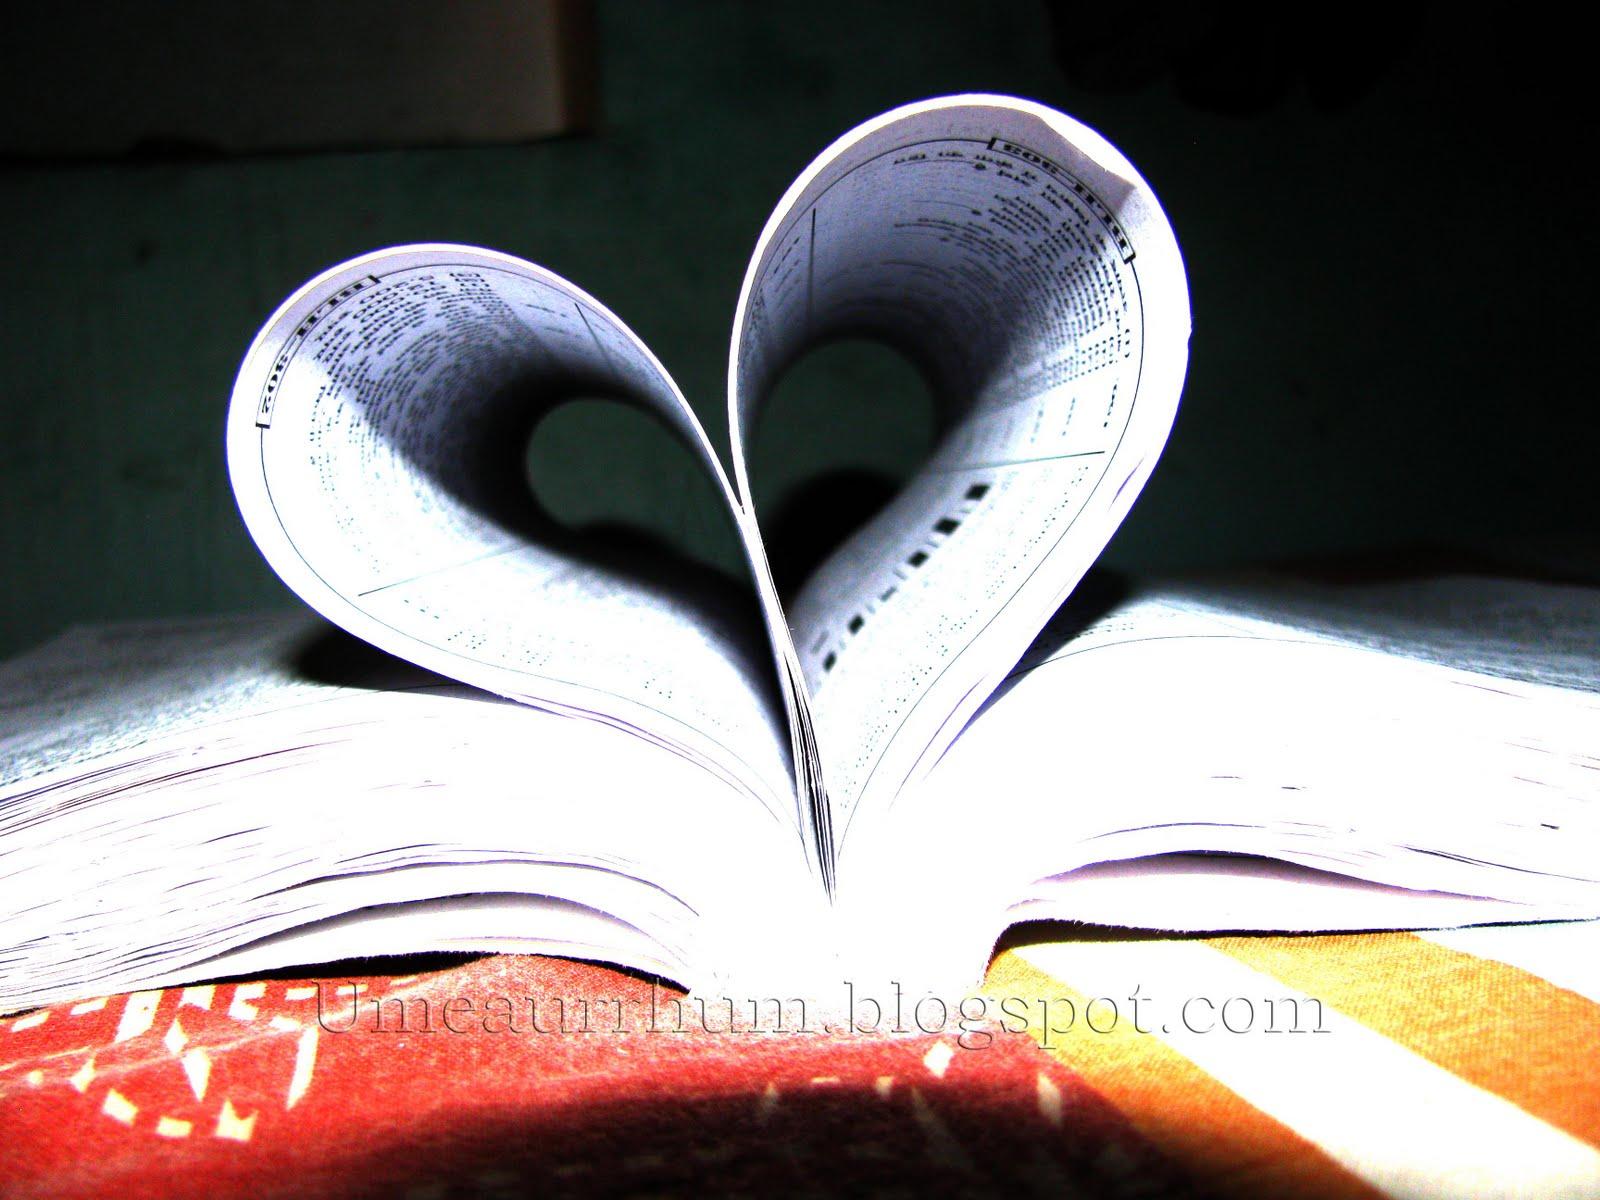 Download romantic love wallpapers - J love wallpaper download ...